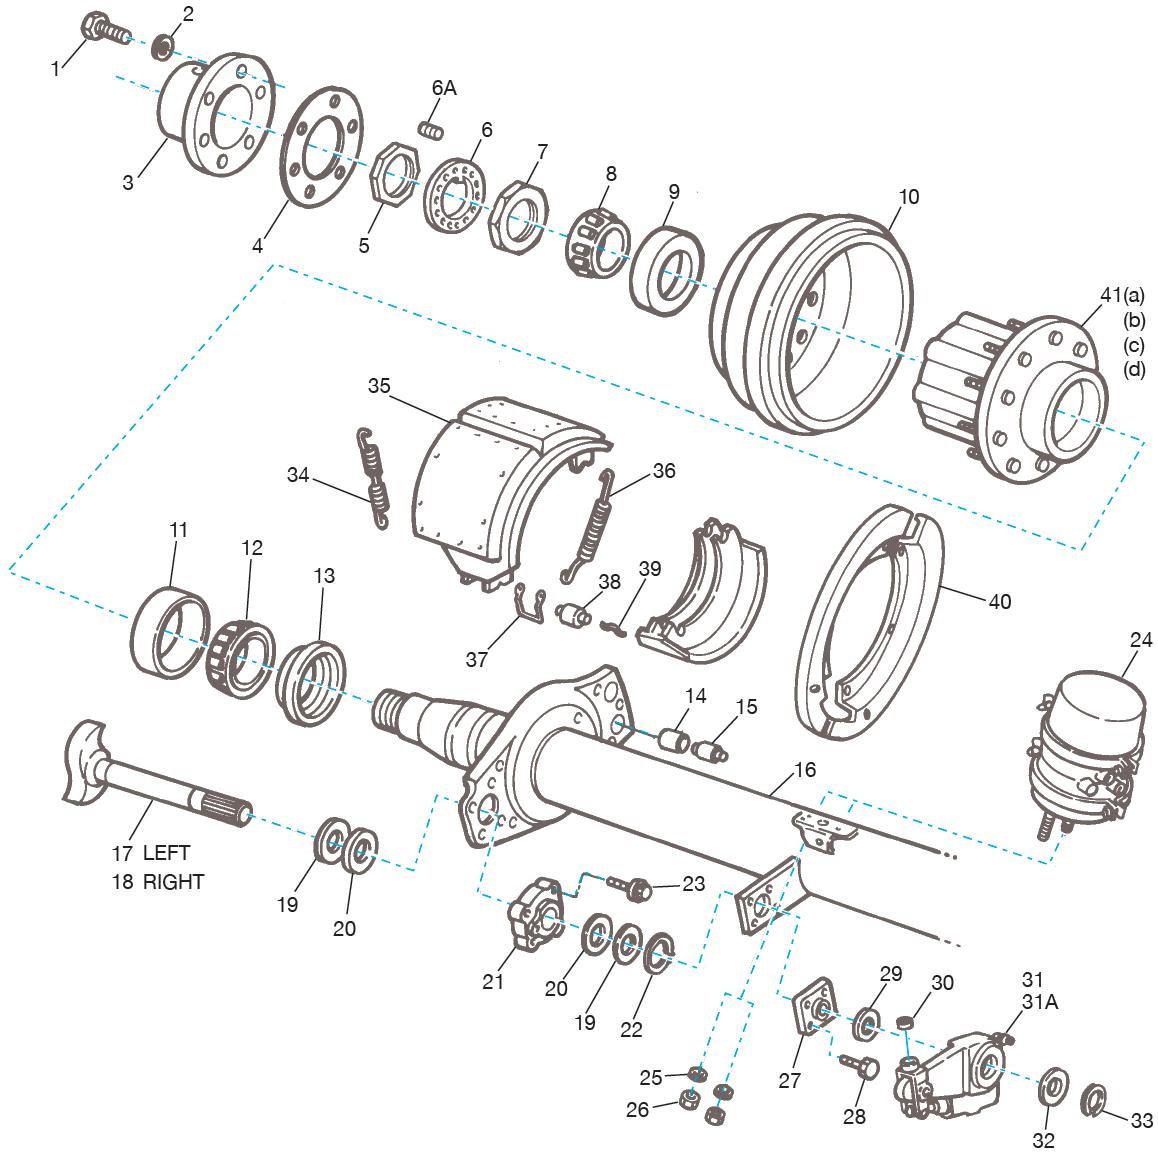 Meritor Steer Axle Parts Catalog : Meritor q brake